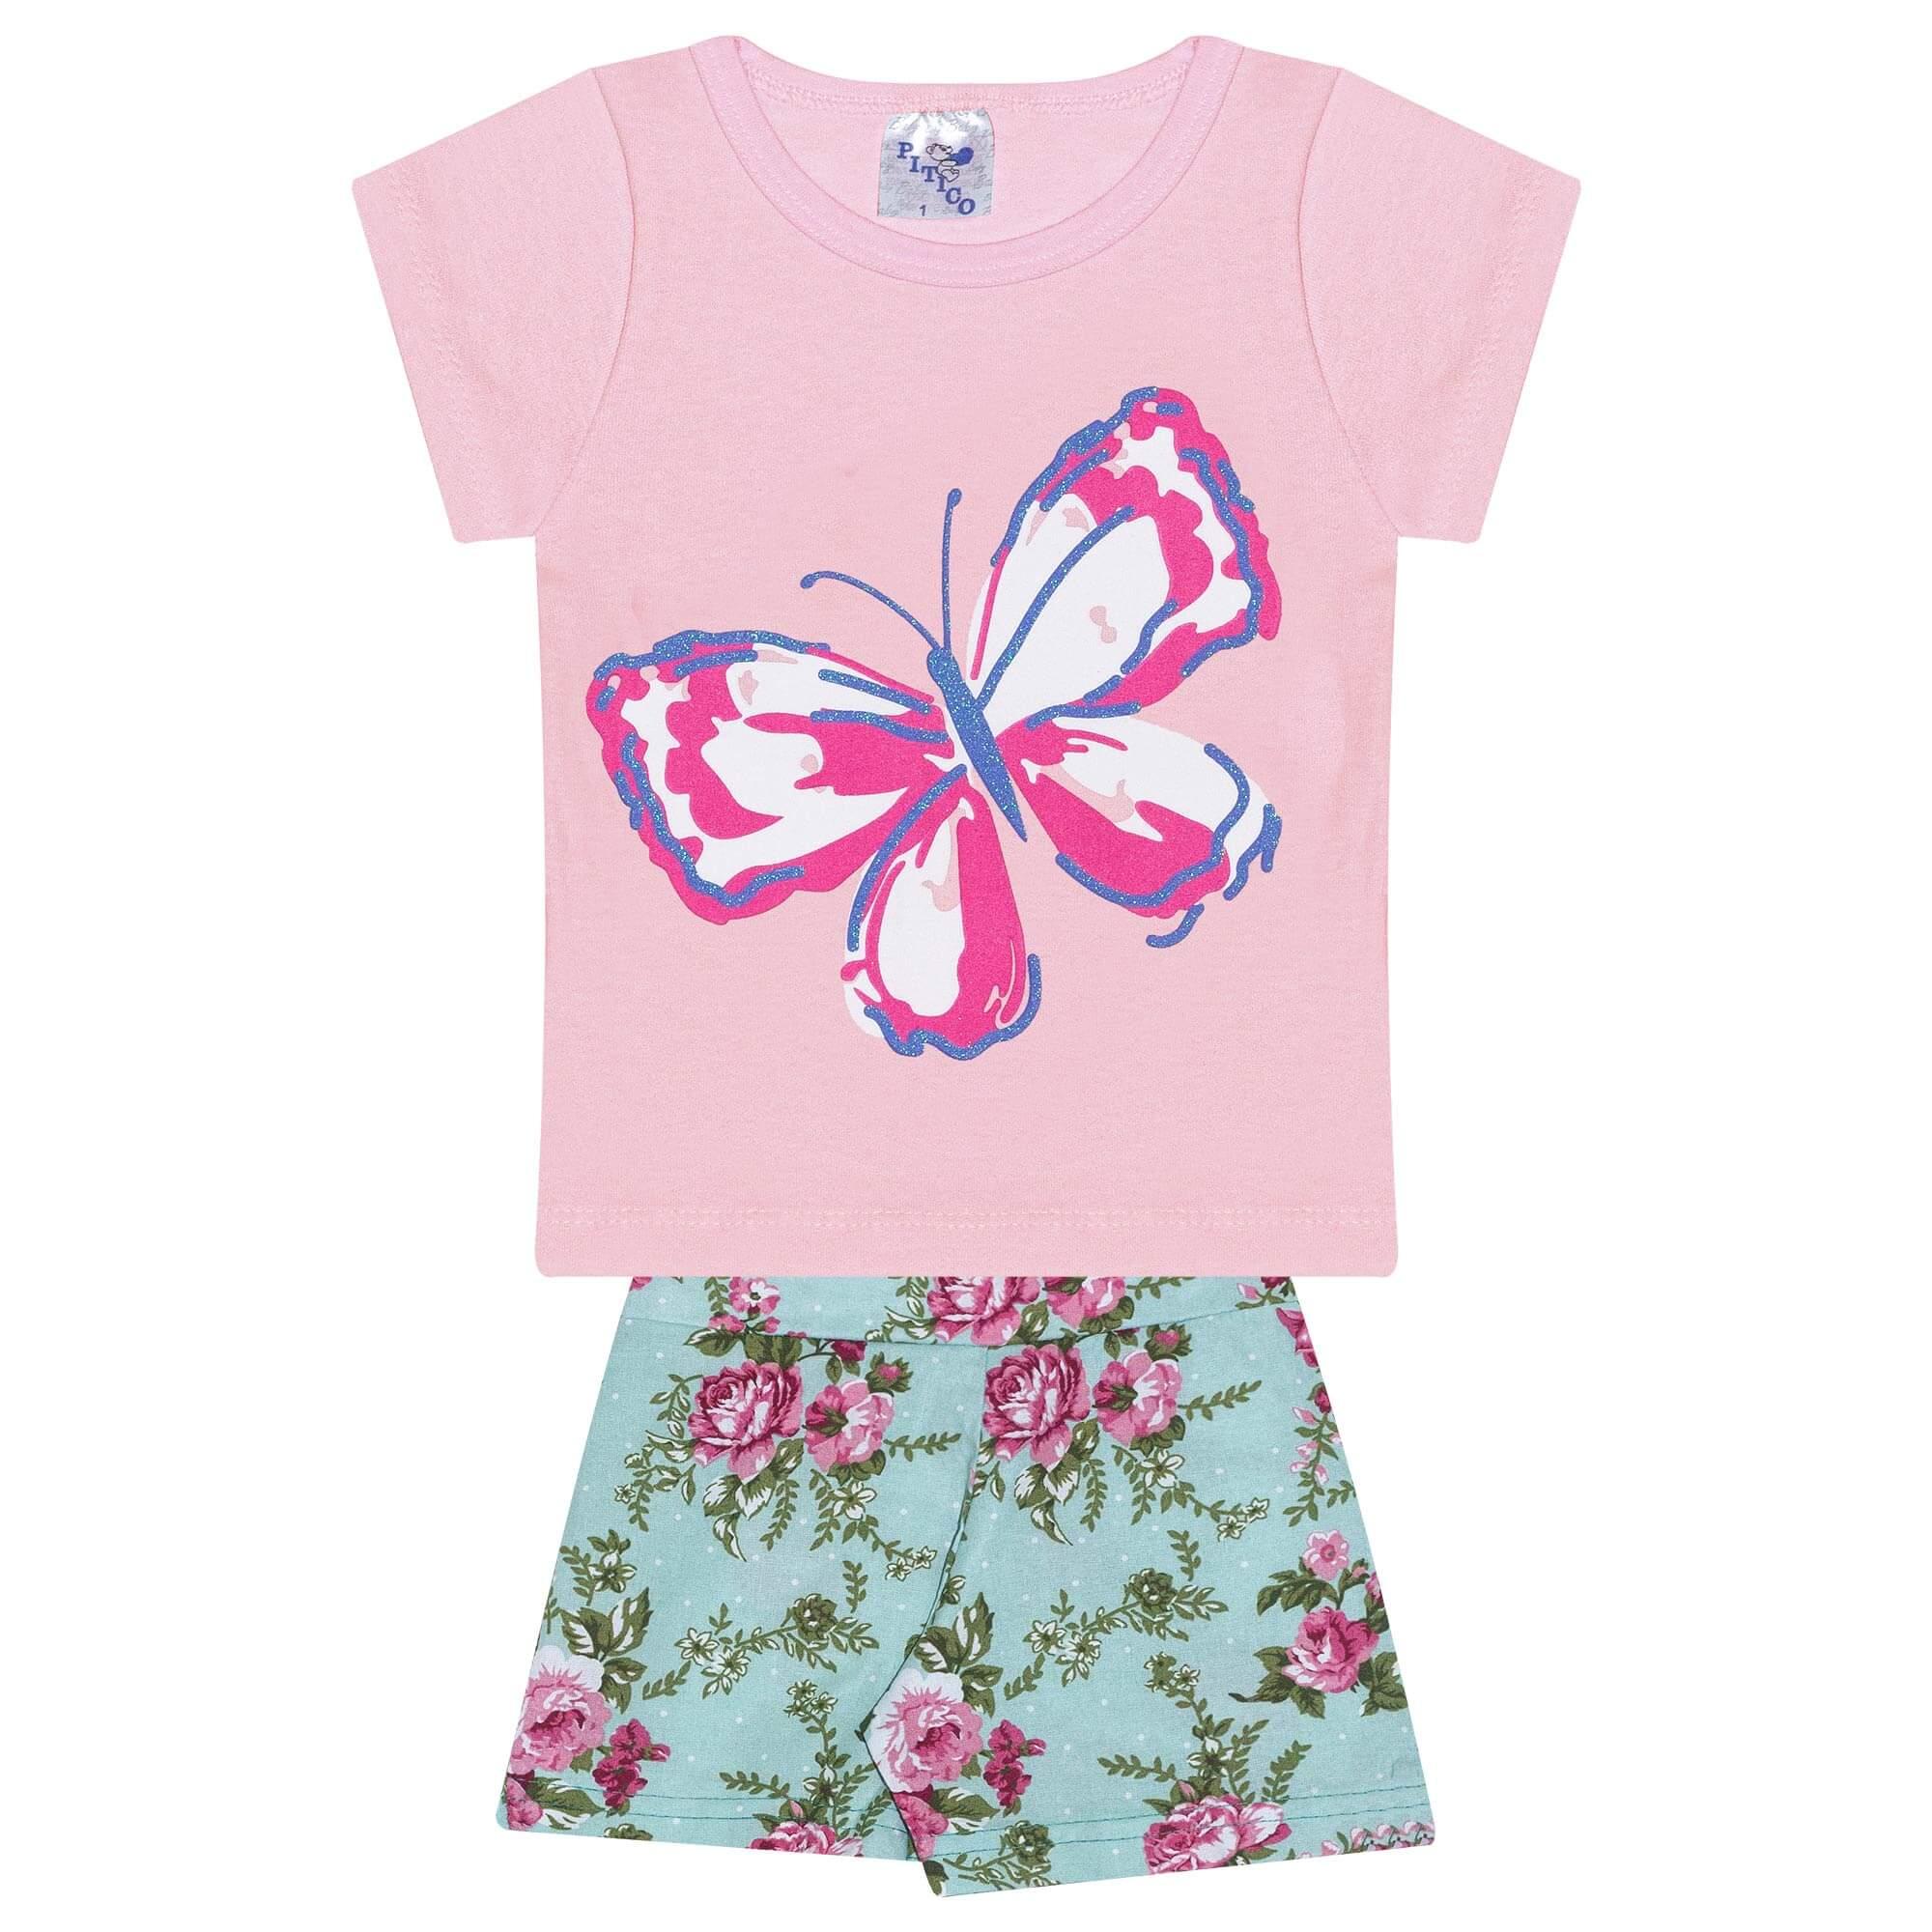 Conjunto Infantil Feminino - Ref 1016 - Rosa/Verde - Pitico